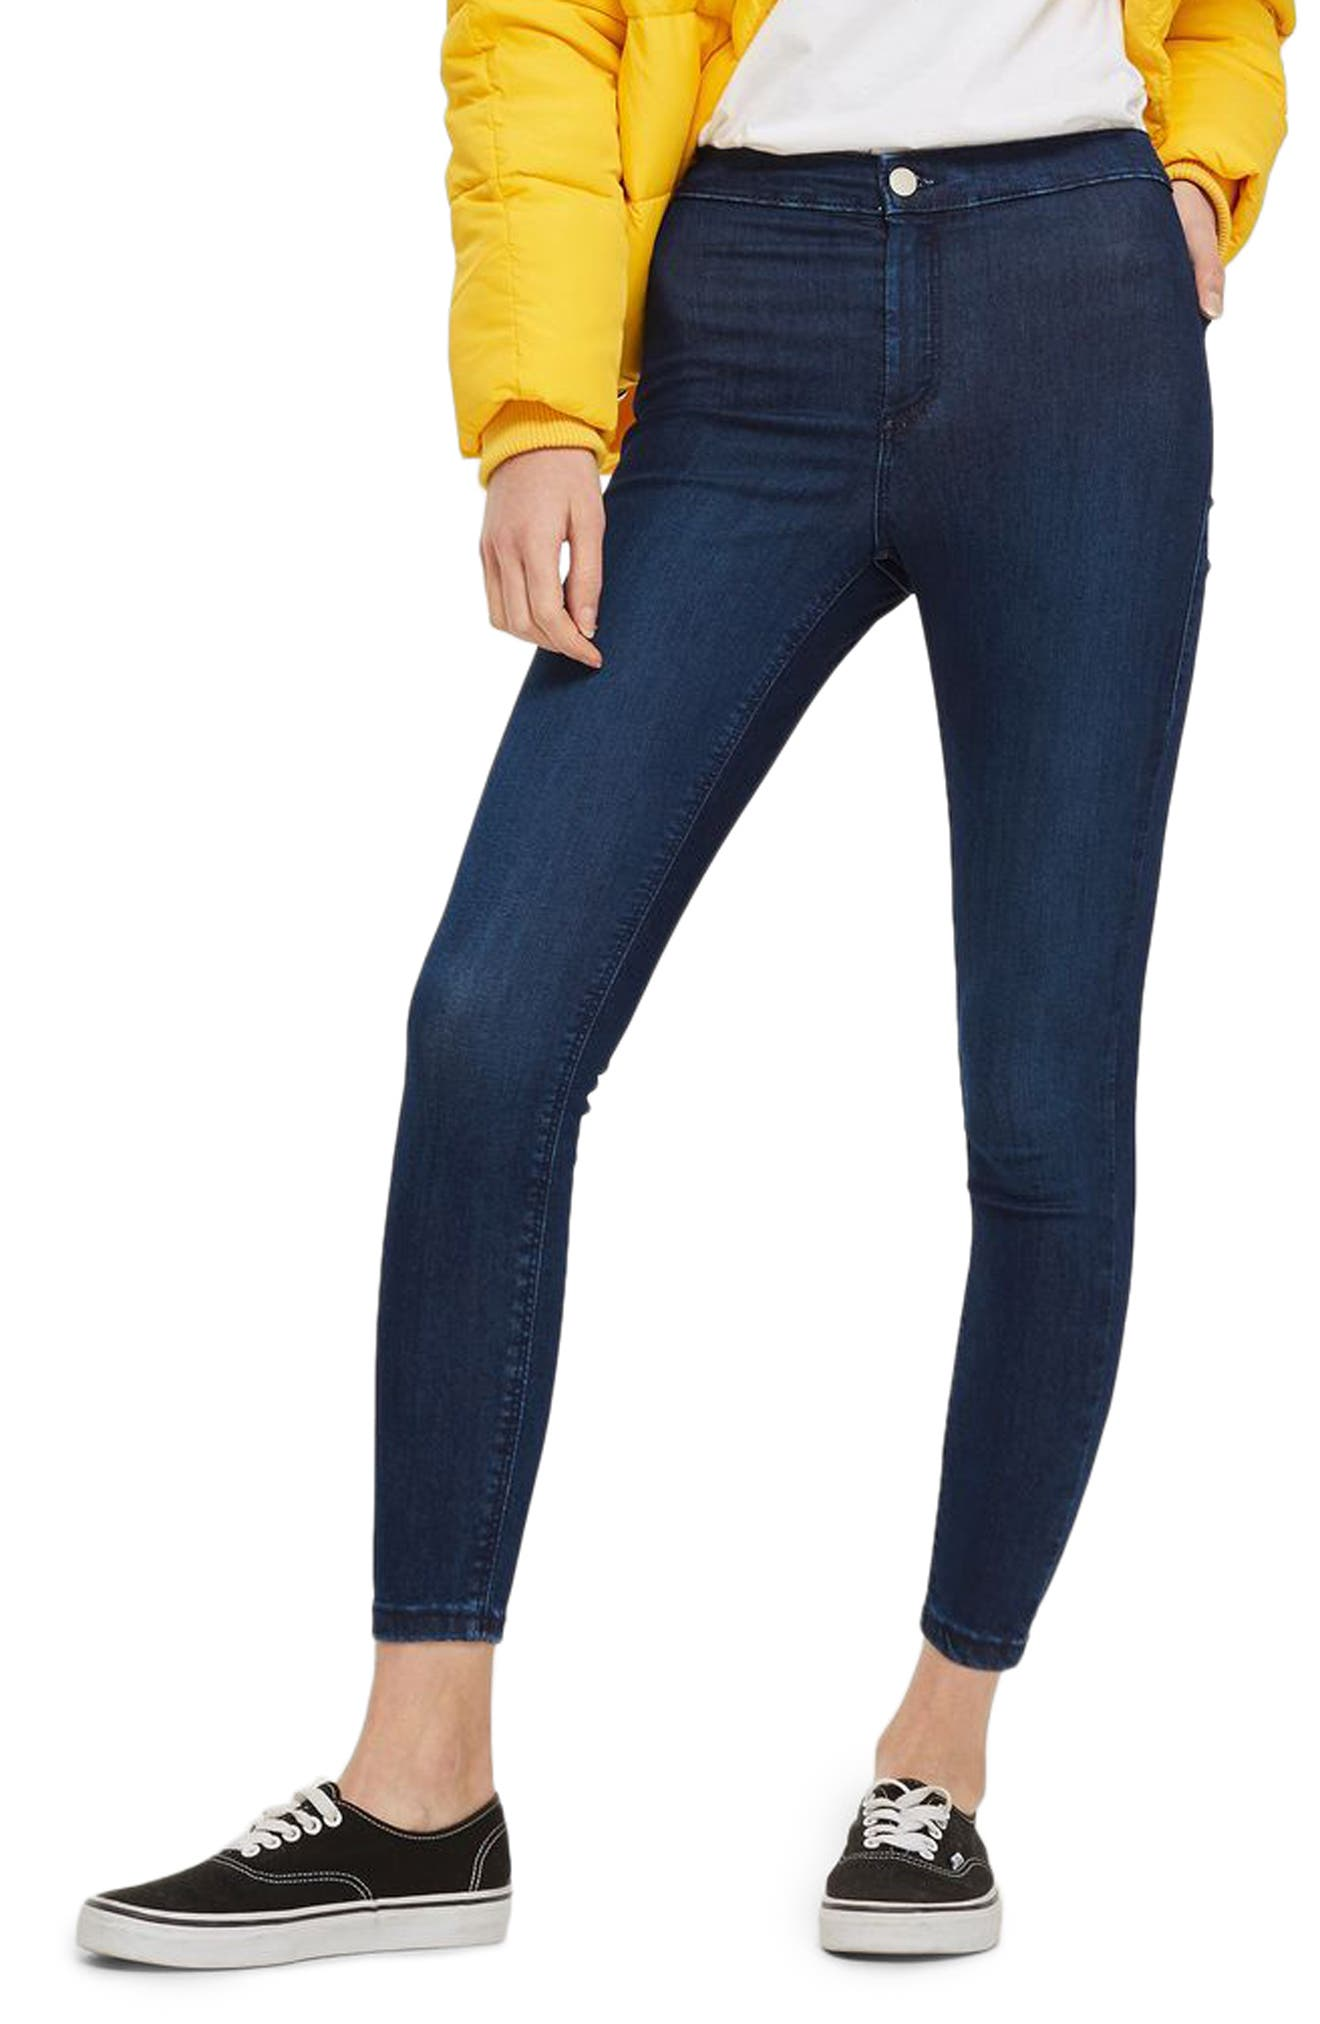 Topshop Joni High Waist Skinny Jeans (Petite)